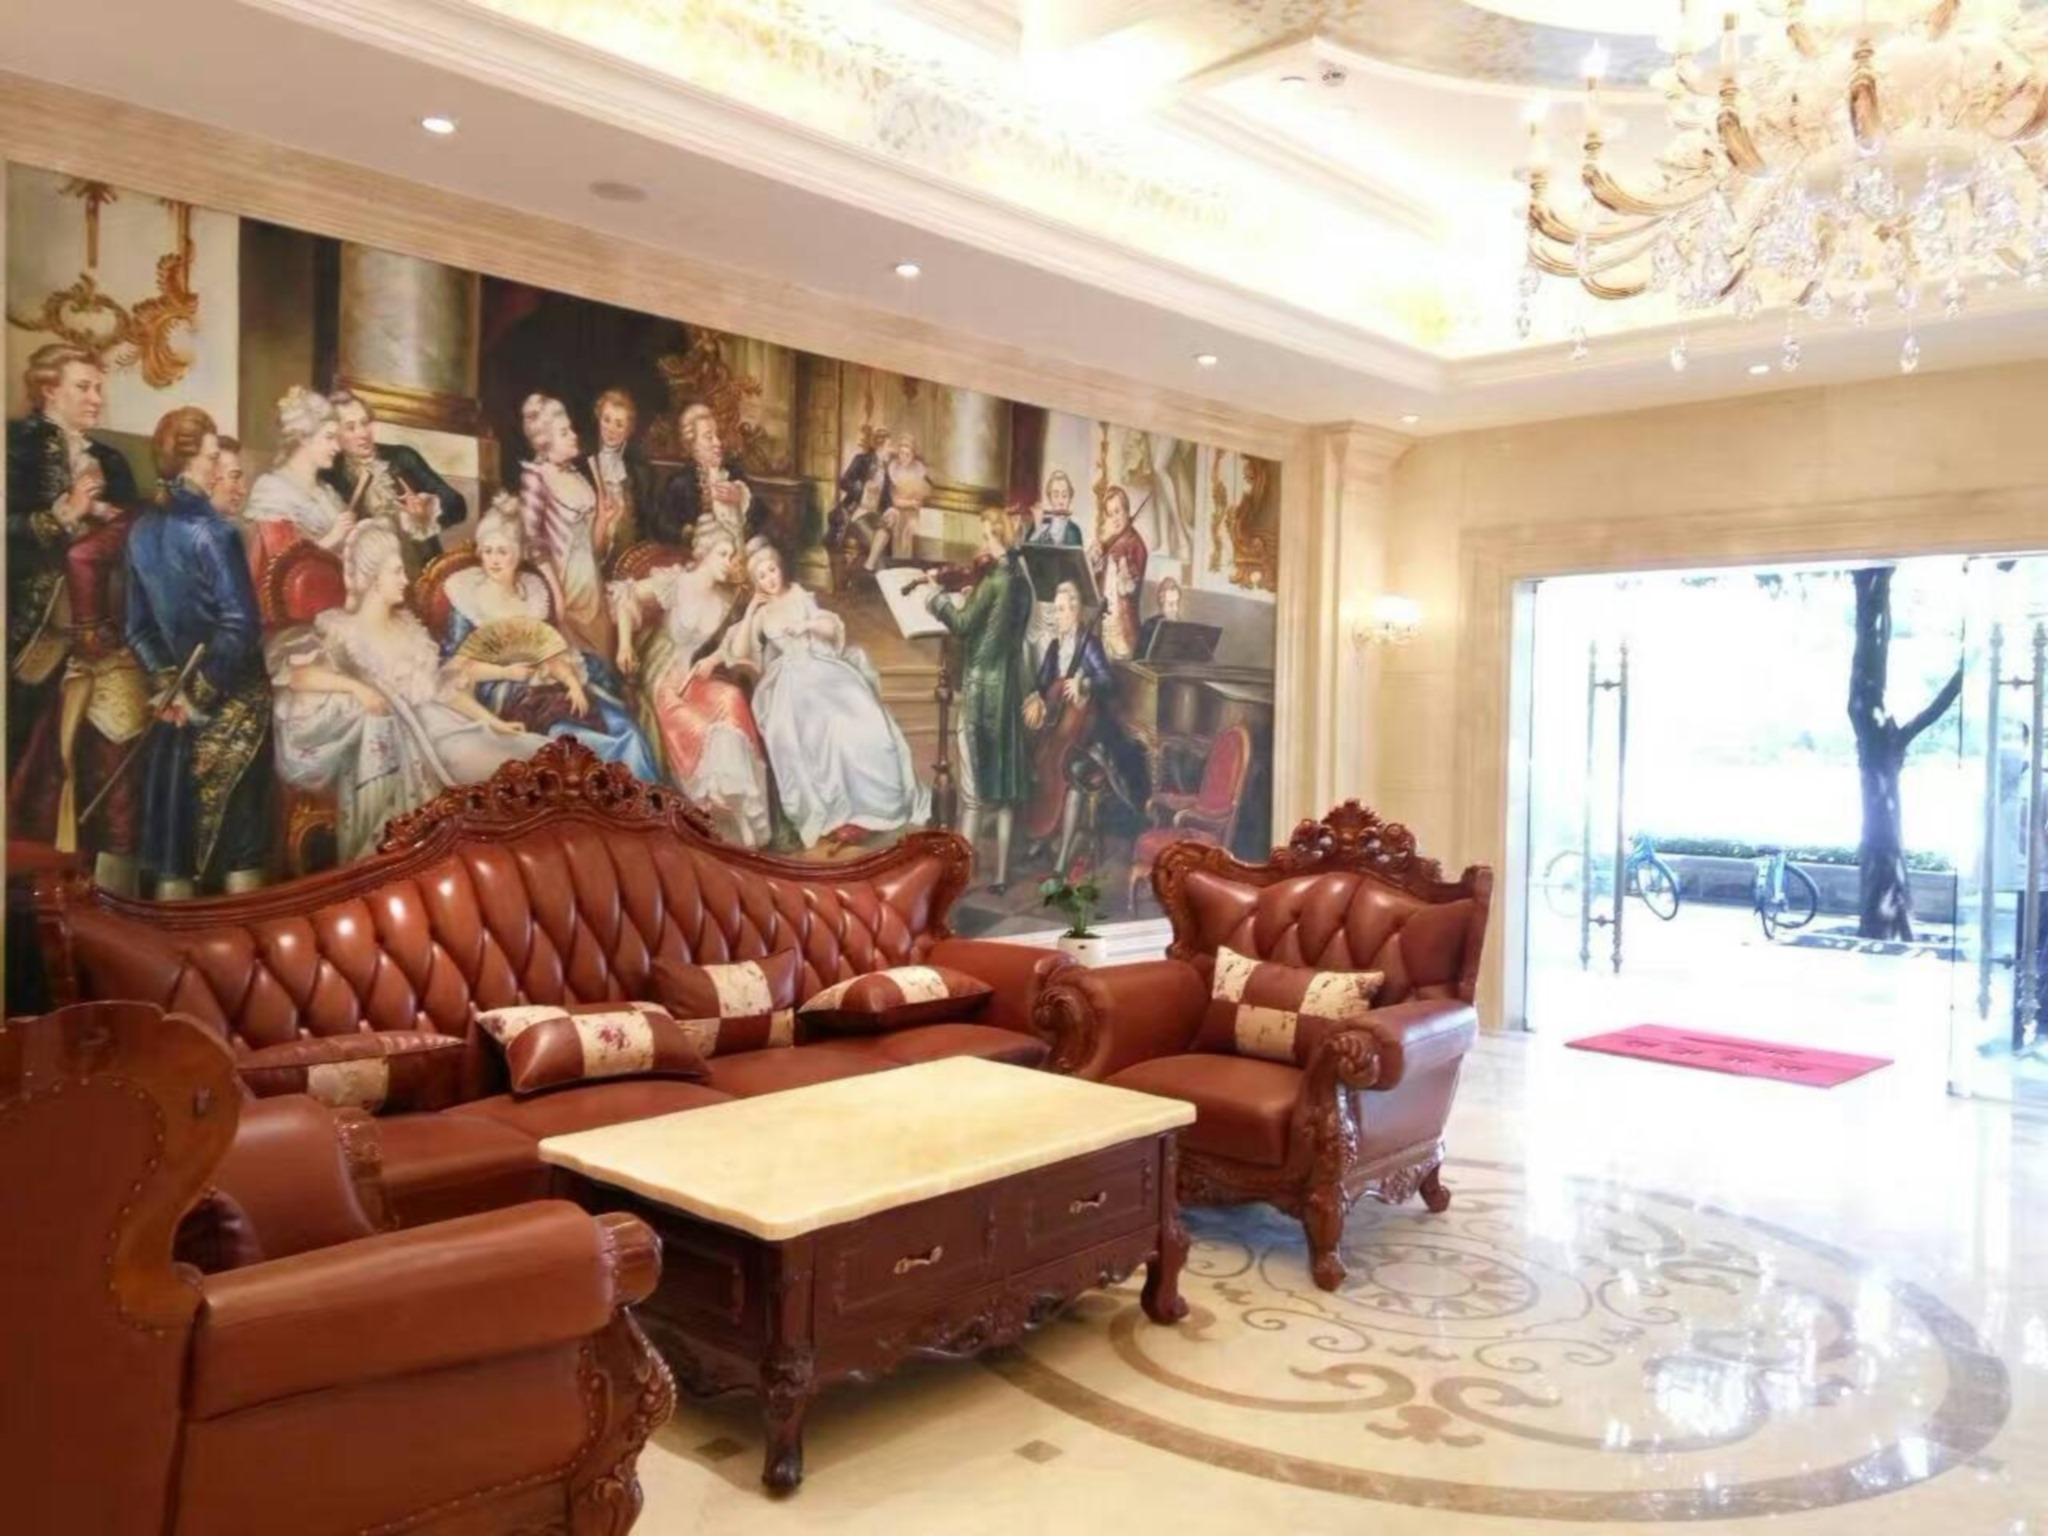 Vienna Hotel Shenzhen Dongmen Hubei Metro Station In China